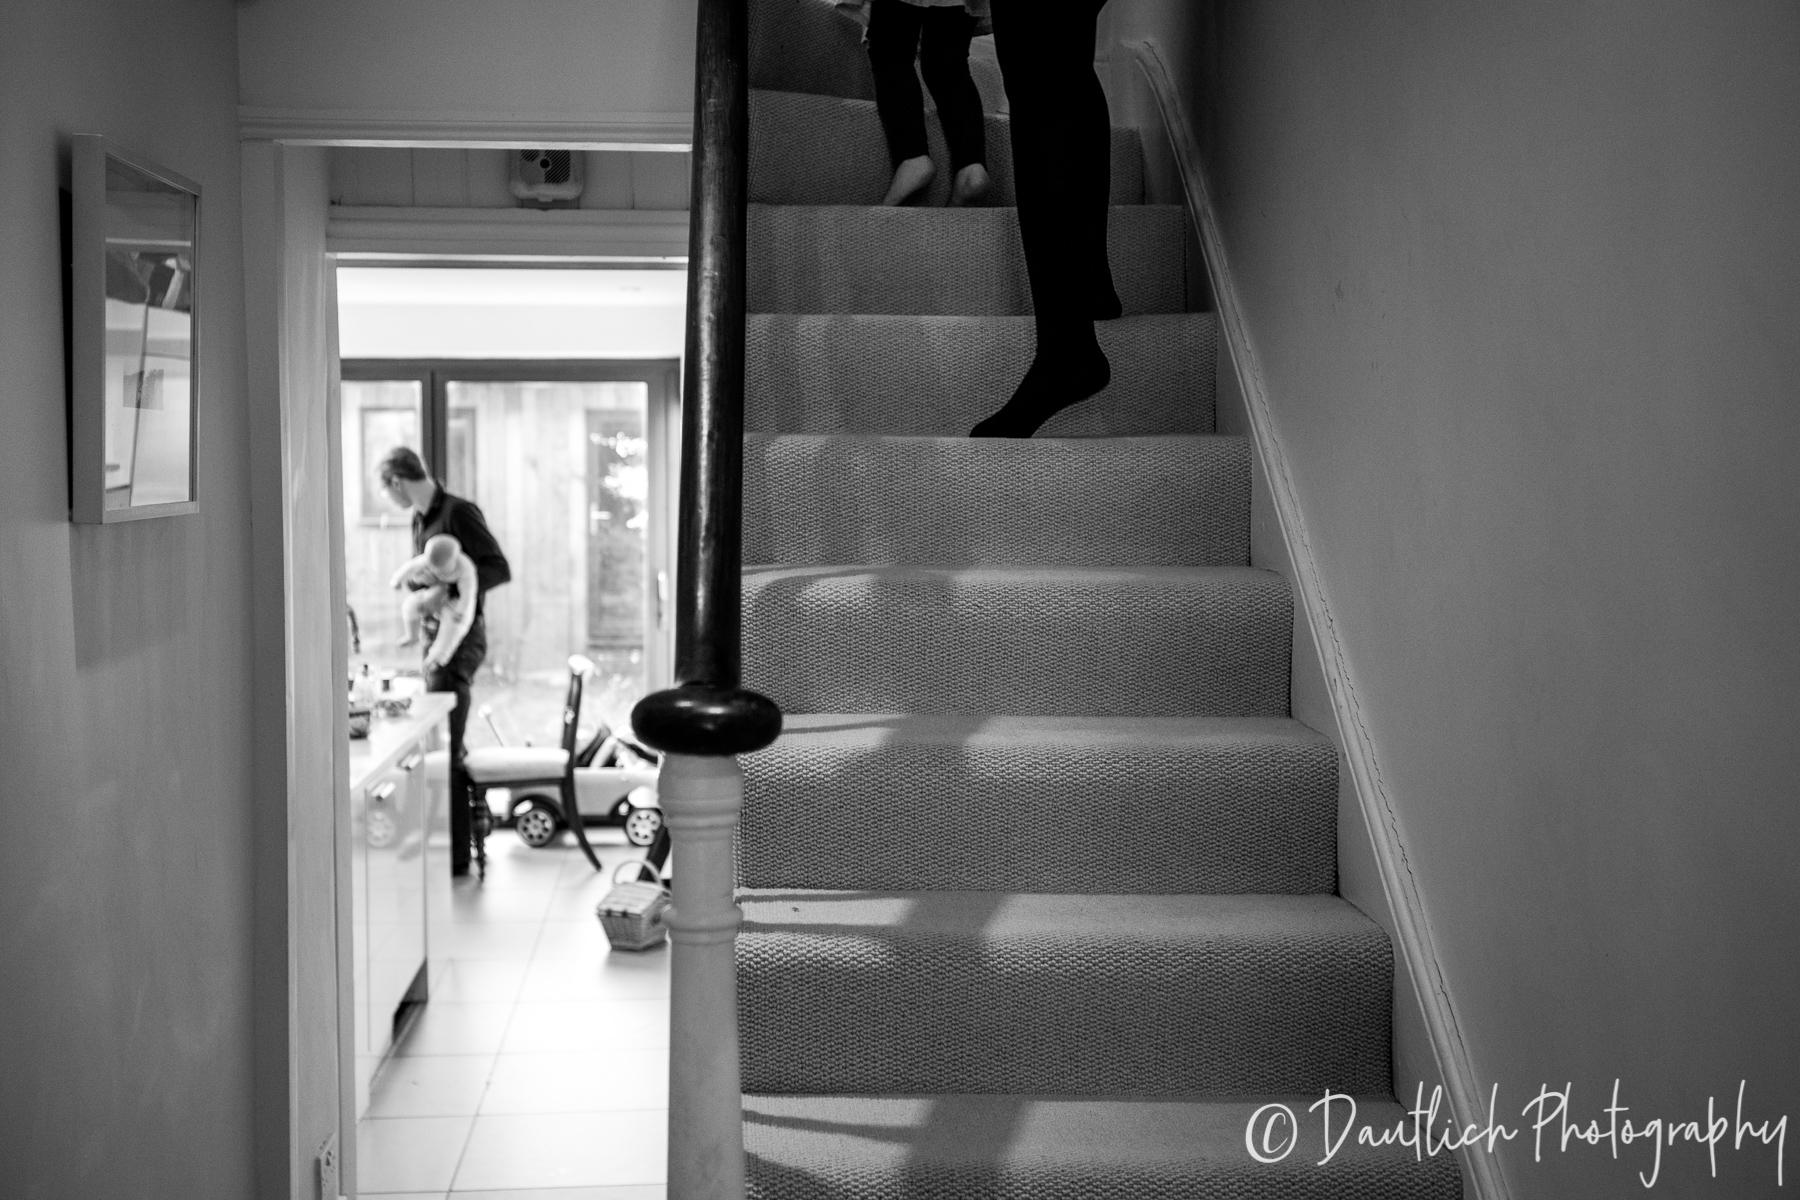 Dautlich_Photography_Apostolov_reedit-49.jpg